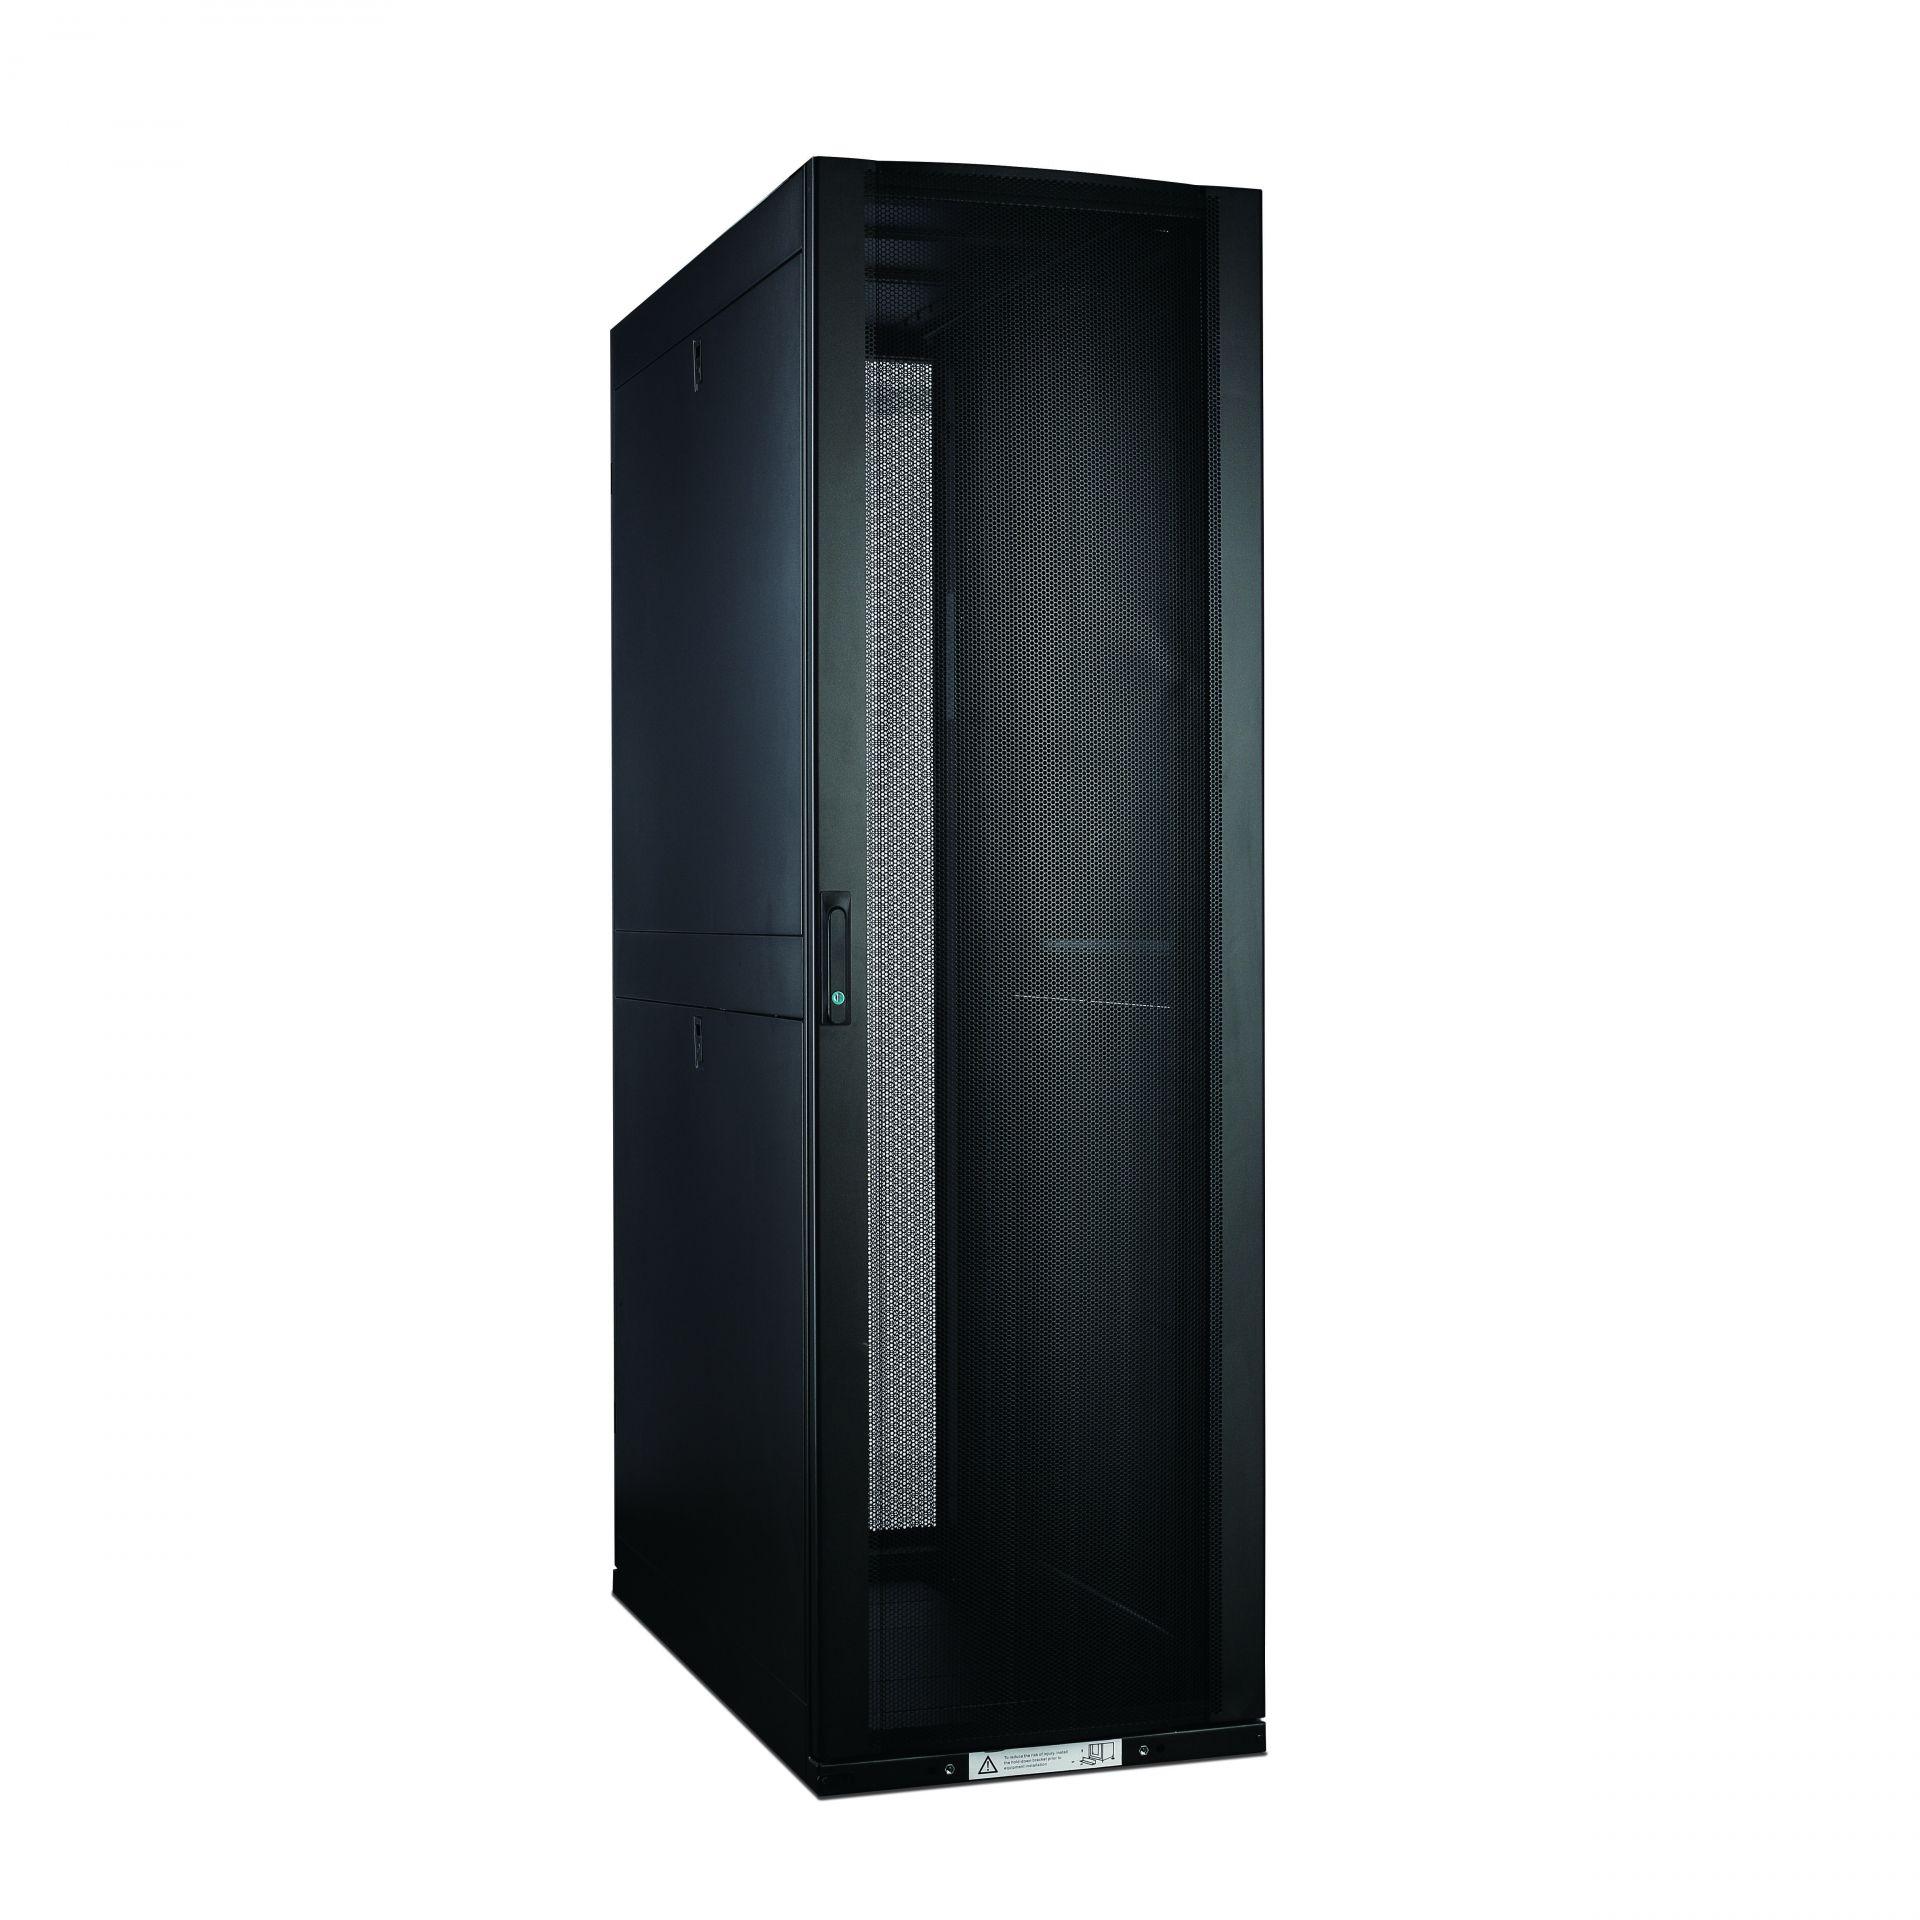 SPCC Server Rack Cabinet